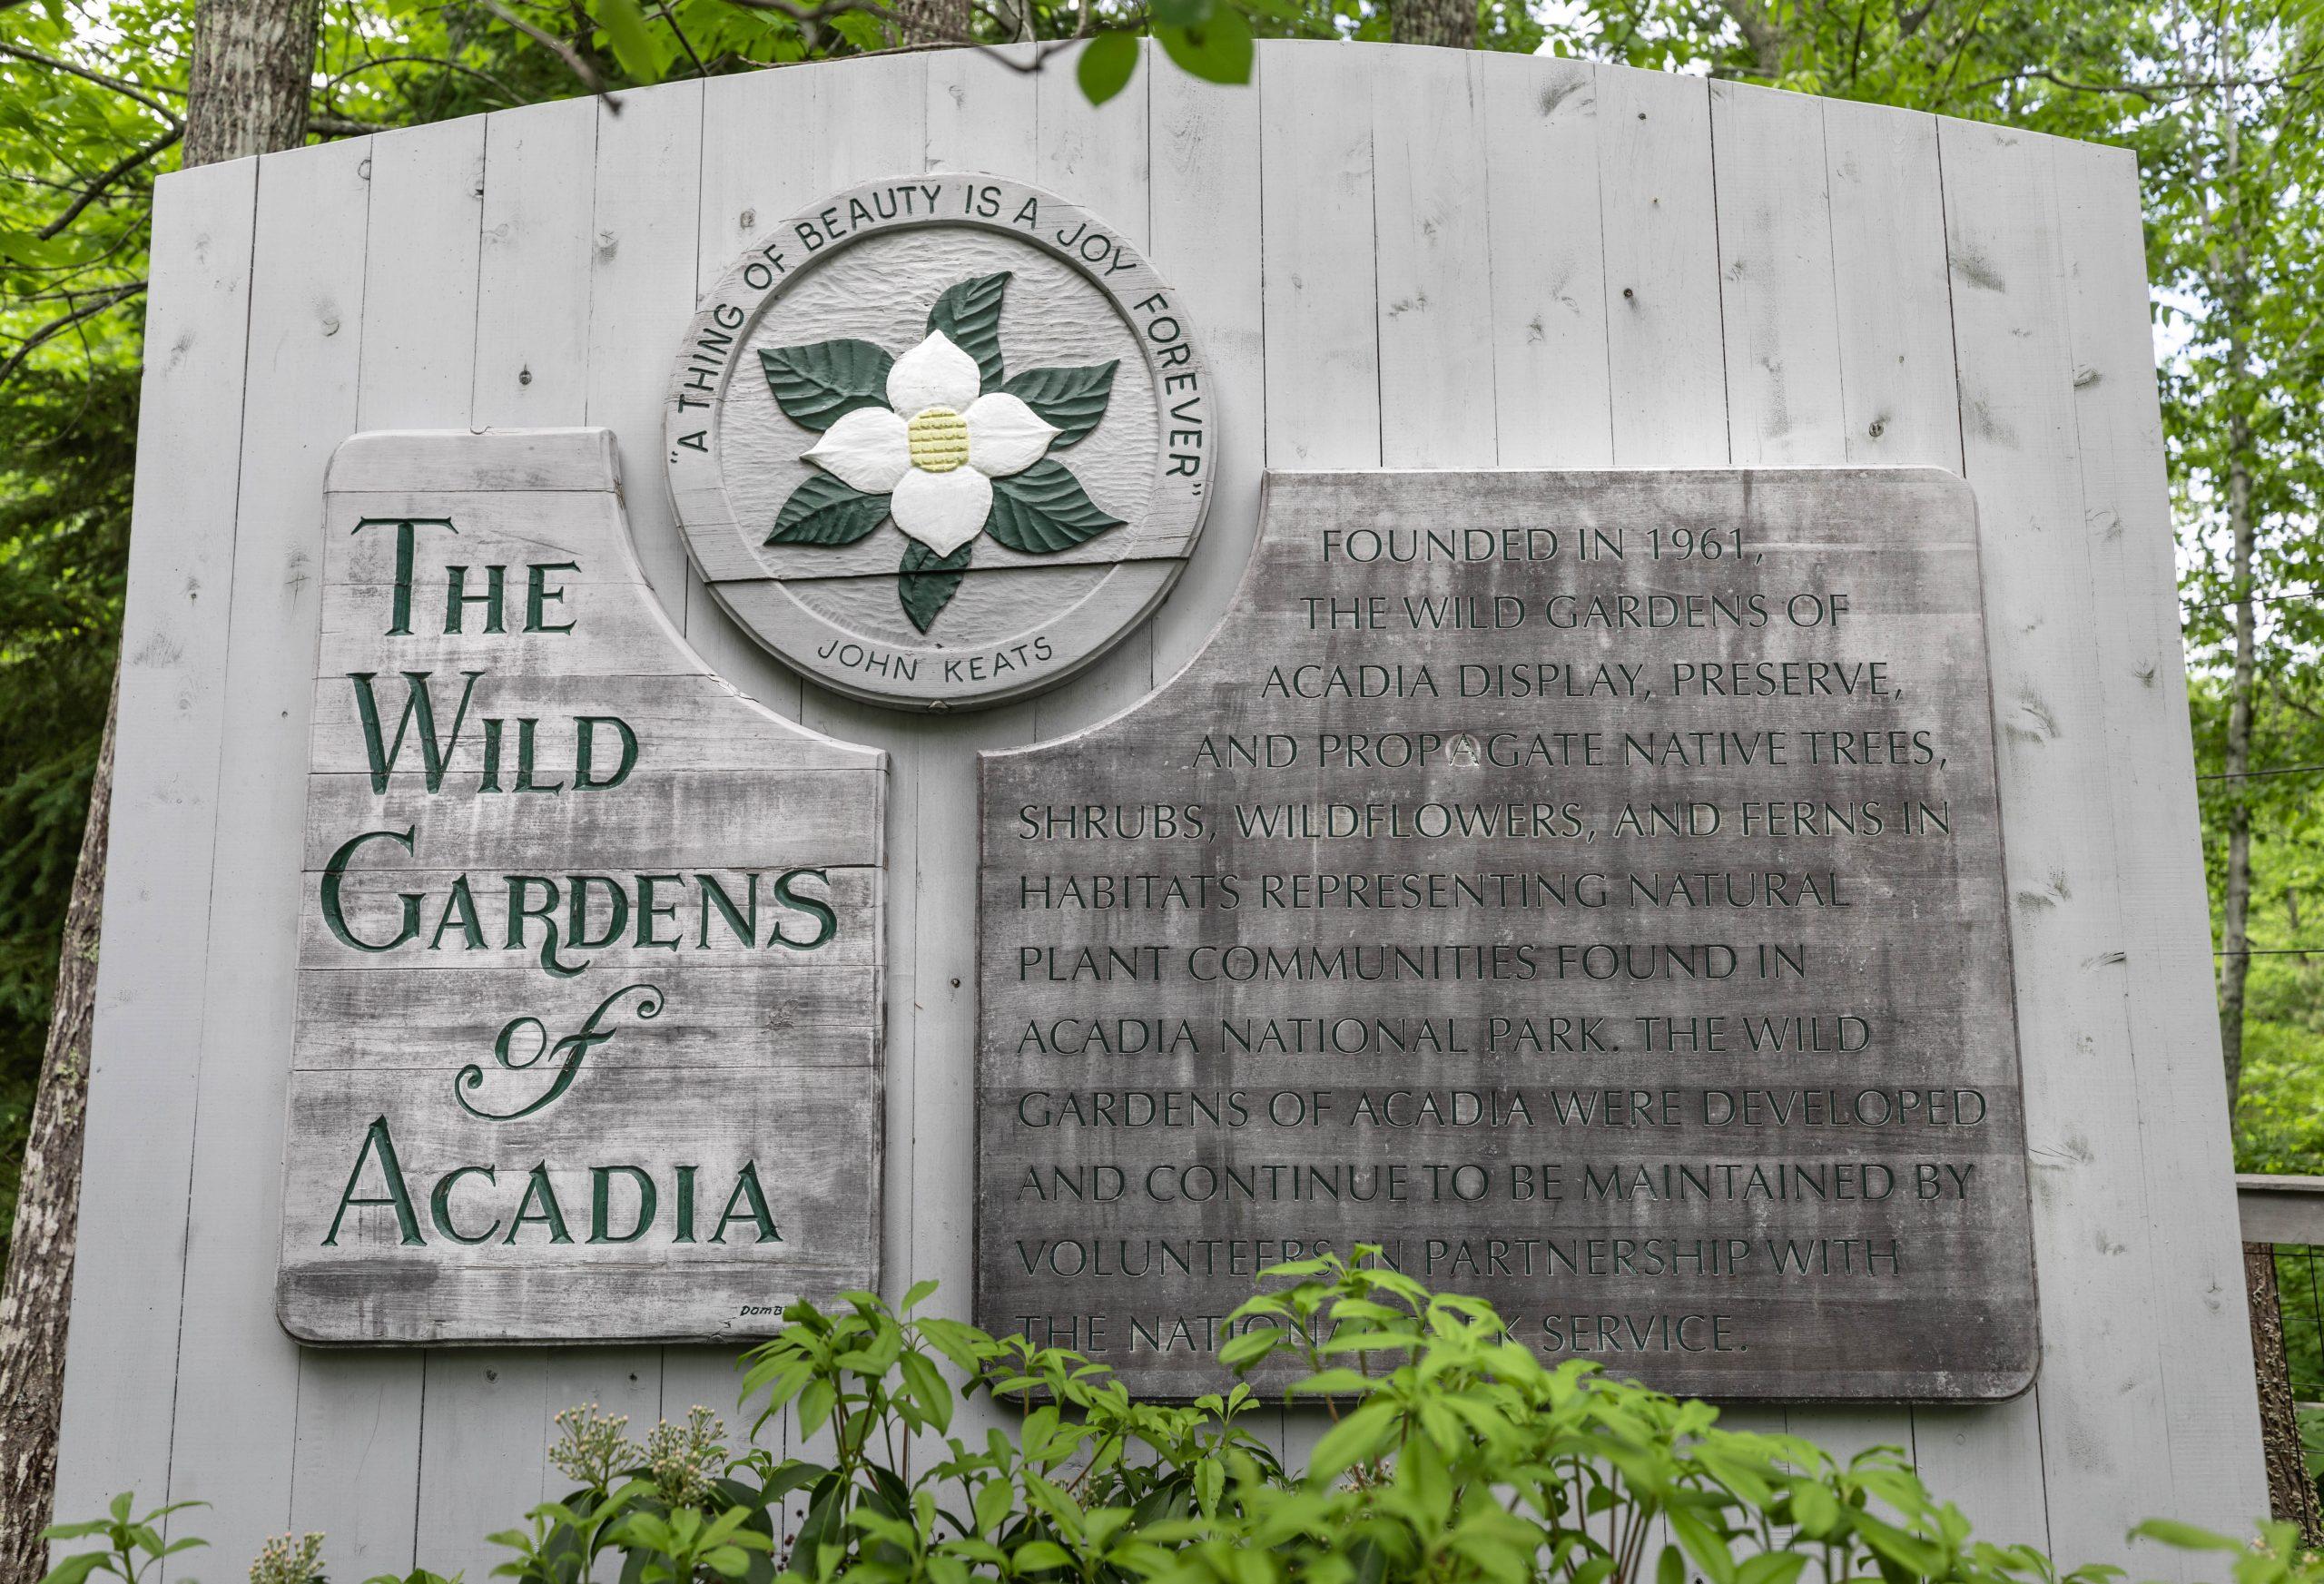 Wild Gardens of Acadia Botanical Garden inside Acadia National Park Mount Desert Island near Bar Harbor Maine Written and Photographed by Luxury Travel Writer Annie Fairfax